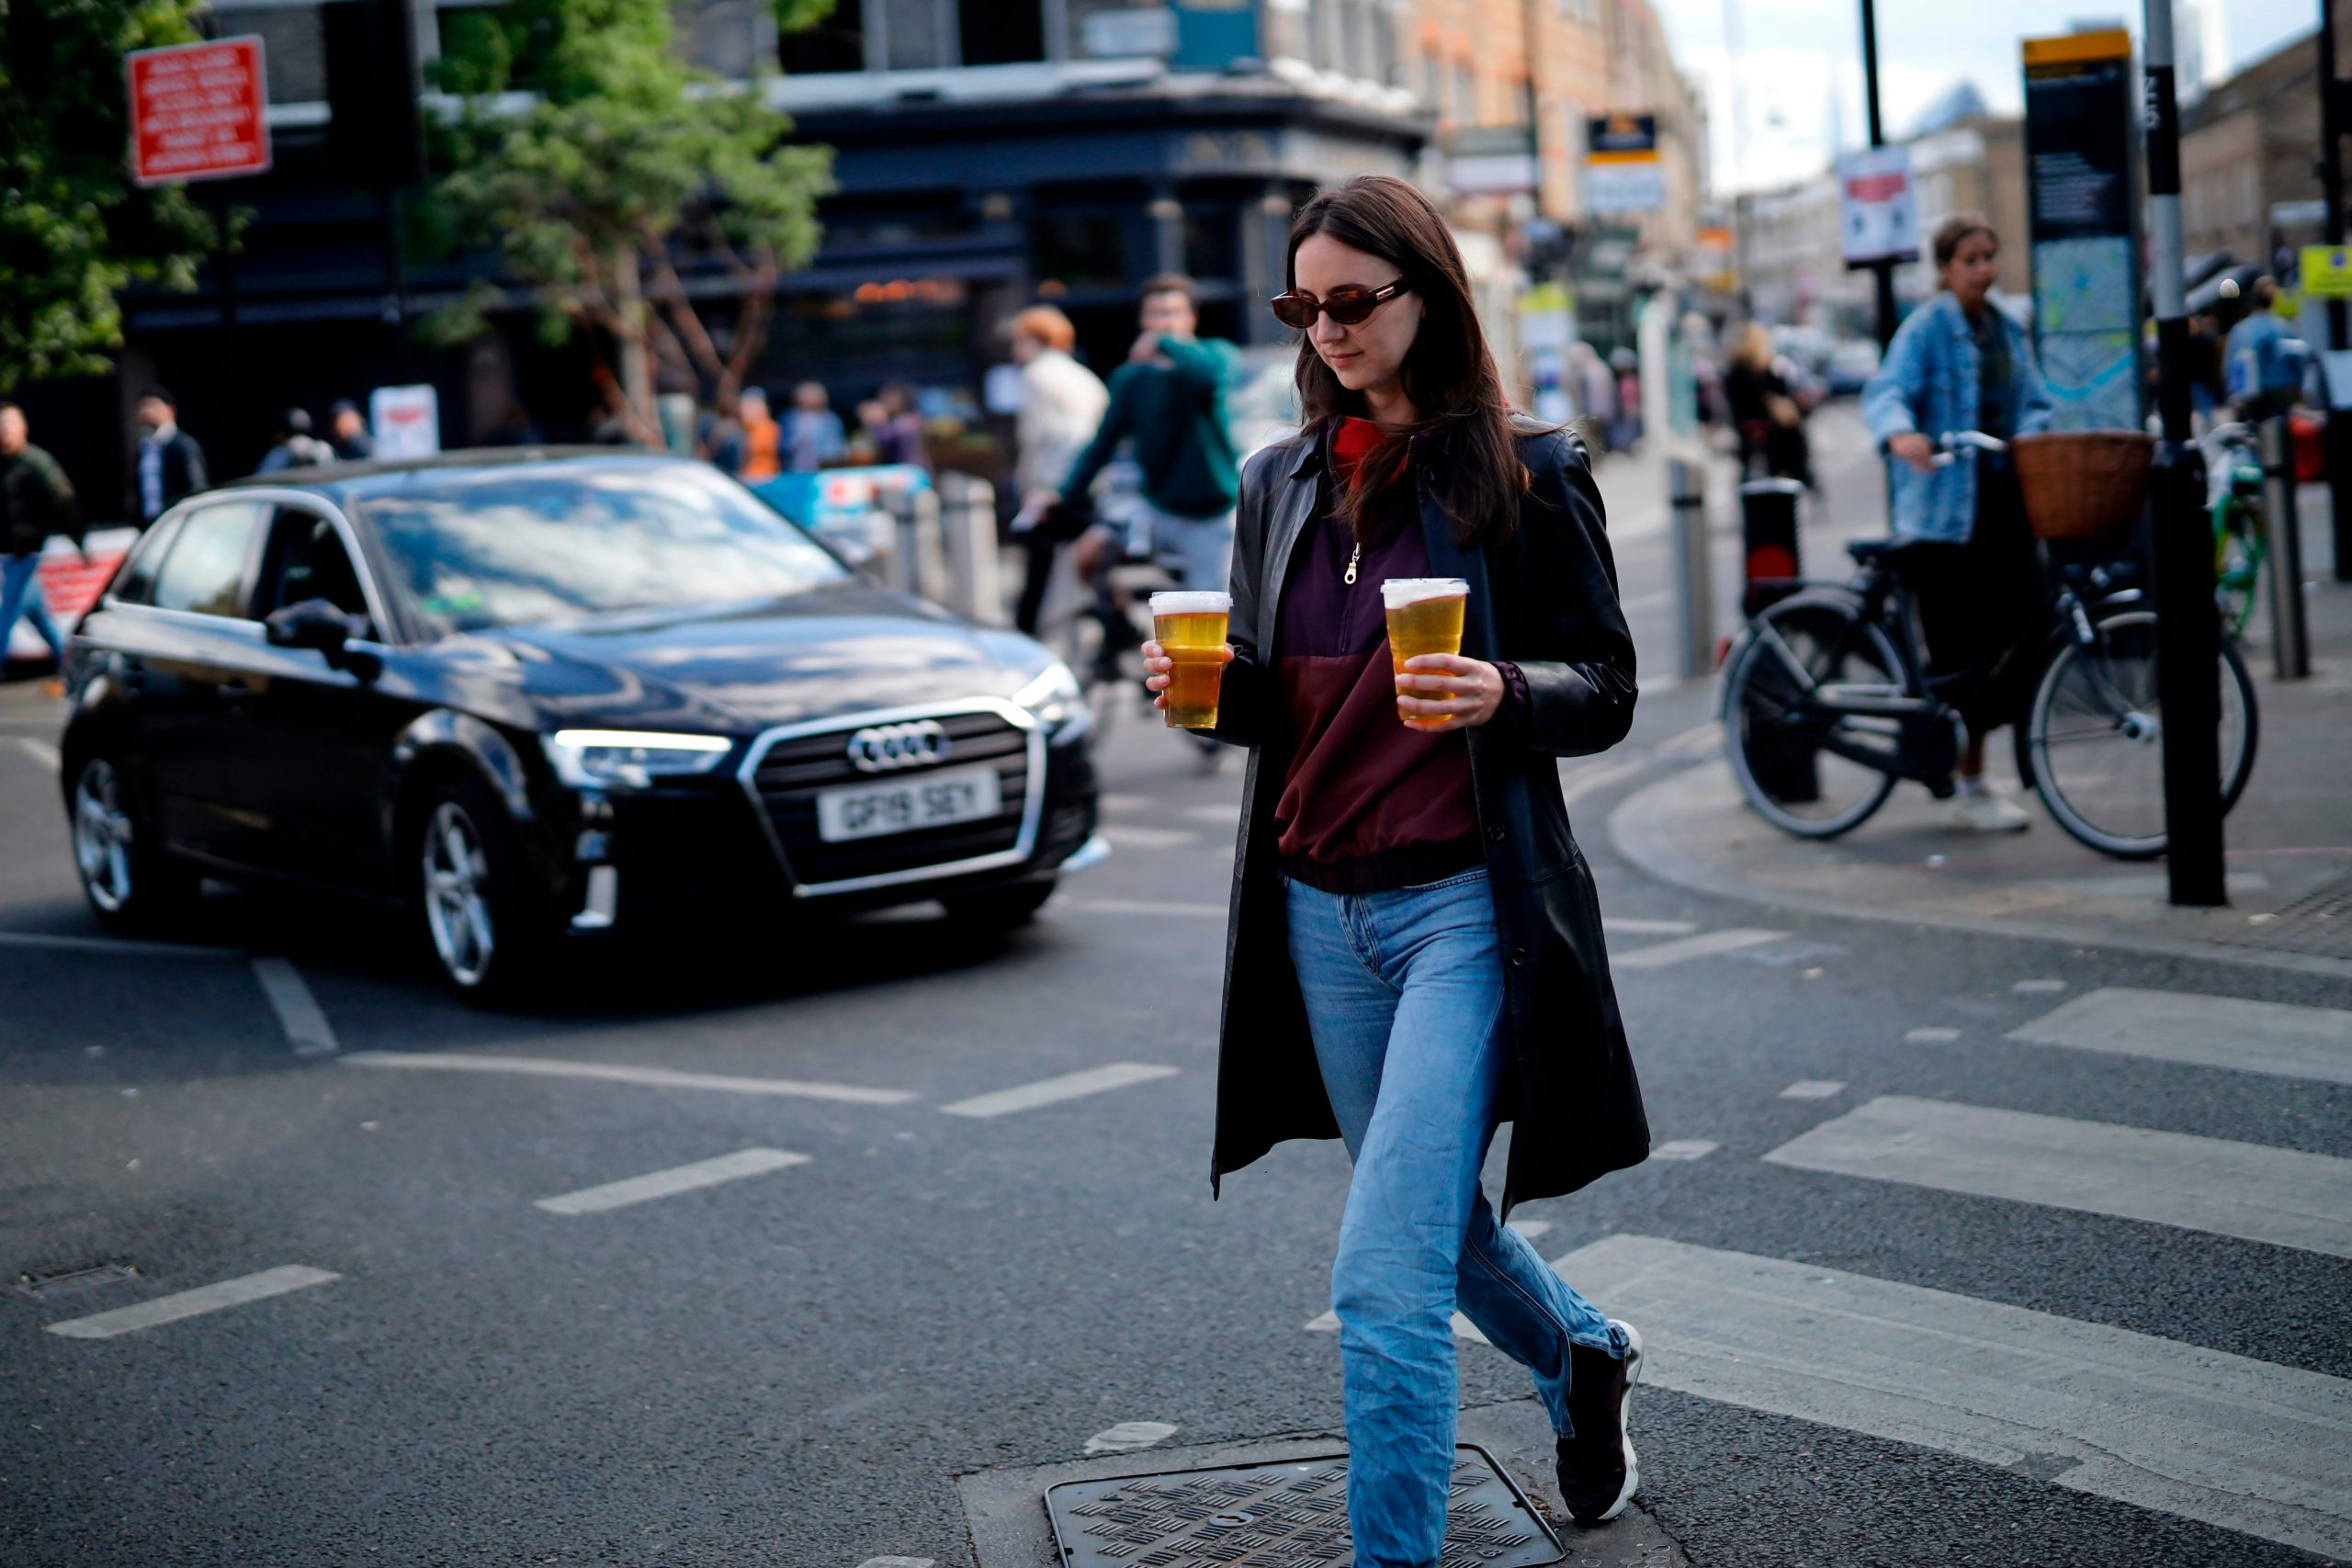 the-pubs-in-london-selling-takeaway-pints-in-lockdown-2.0